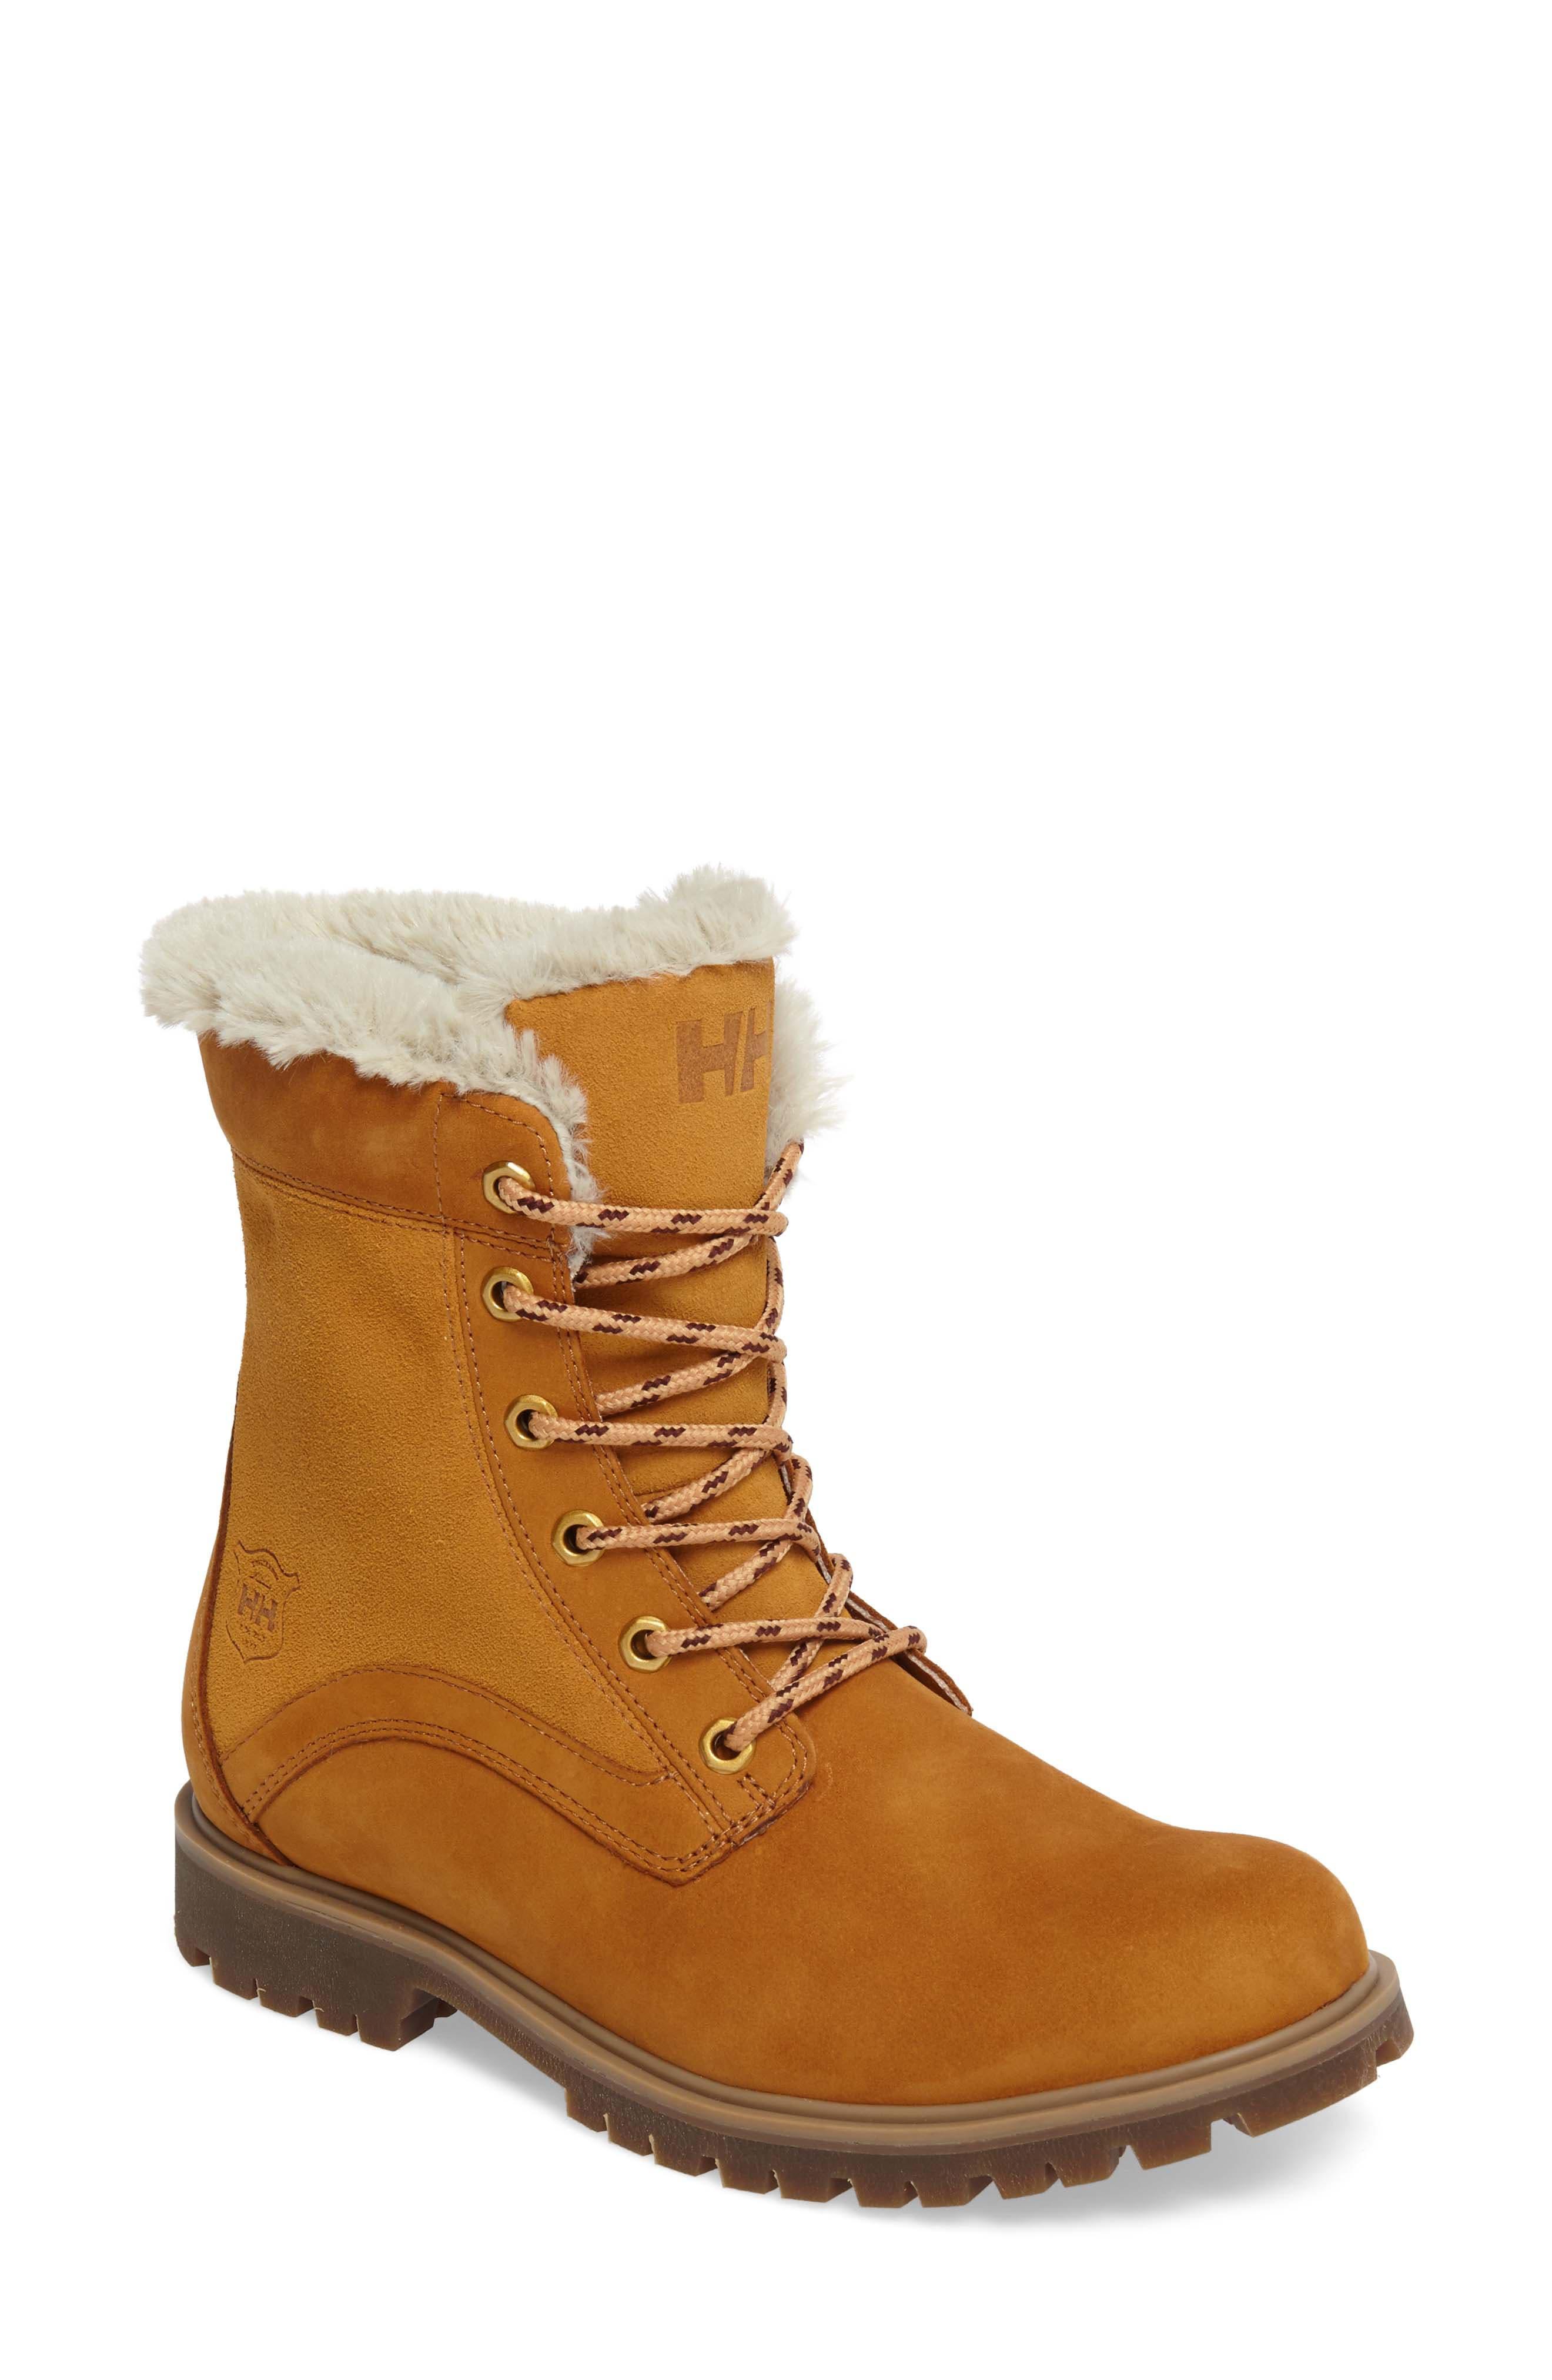 Main Image - Helly Hansen Marion Waterproof Winter Boot (Women)